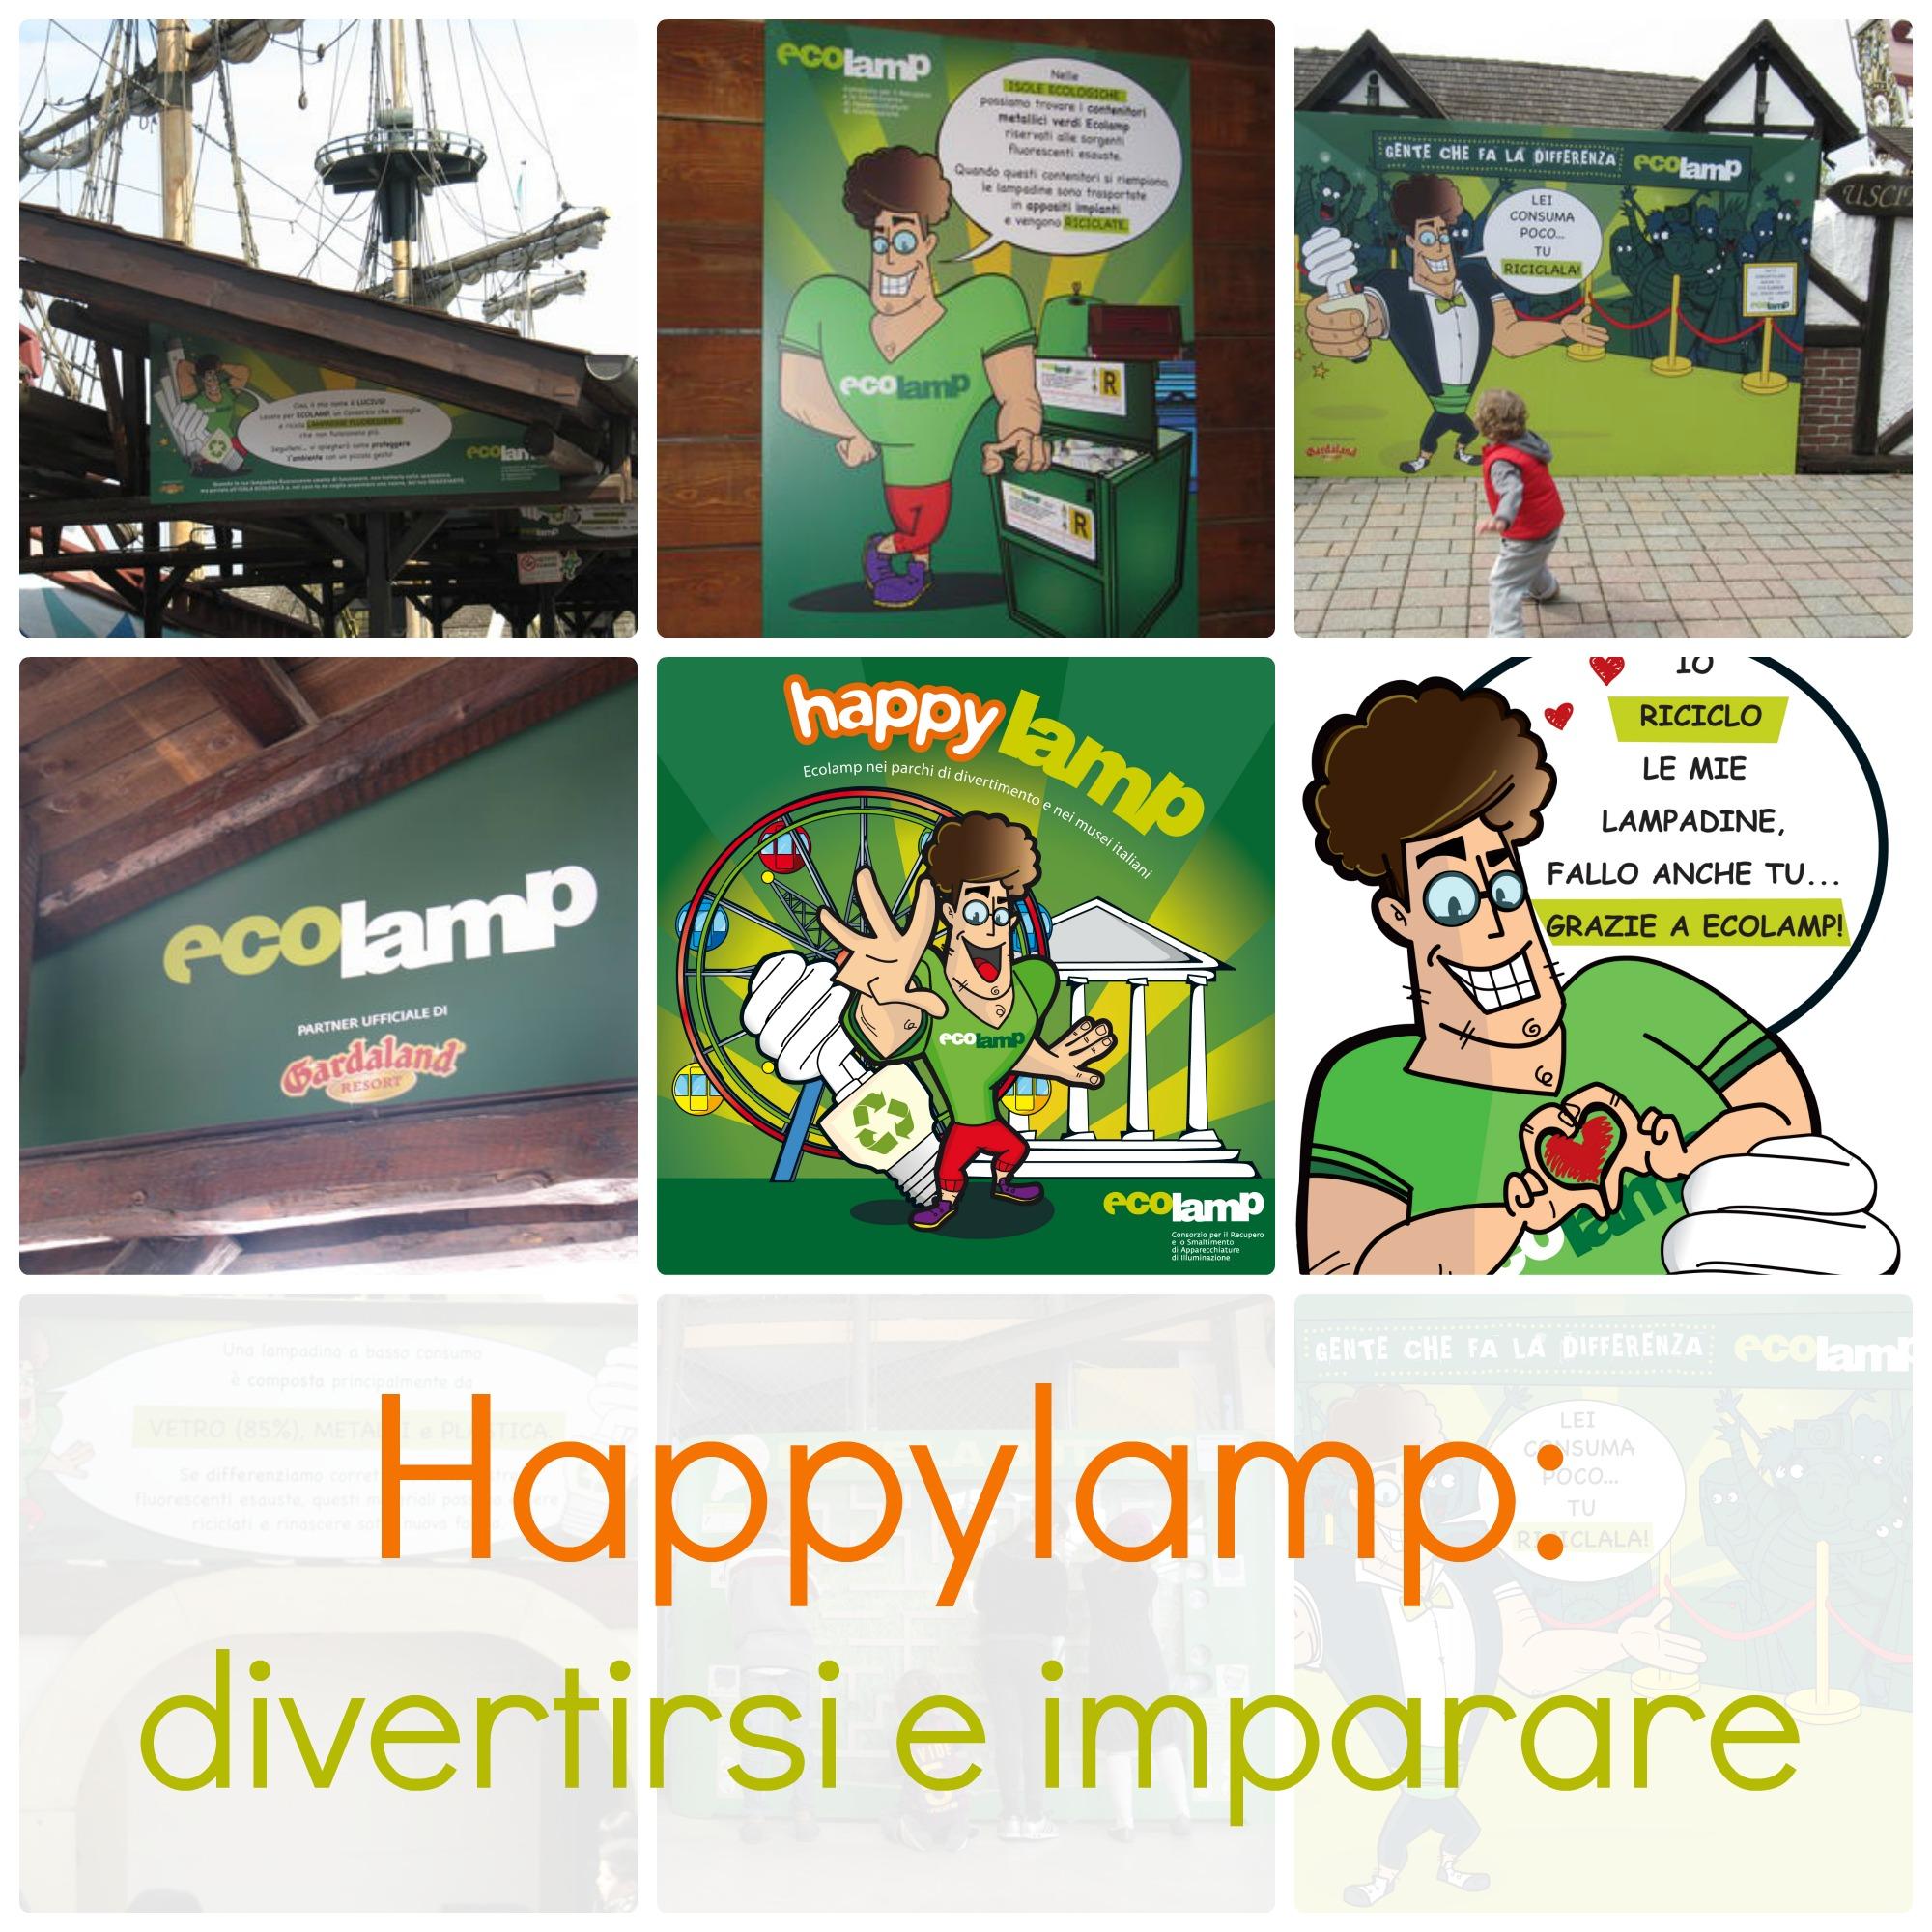 Happylamp